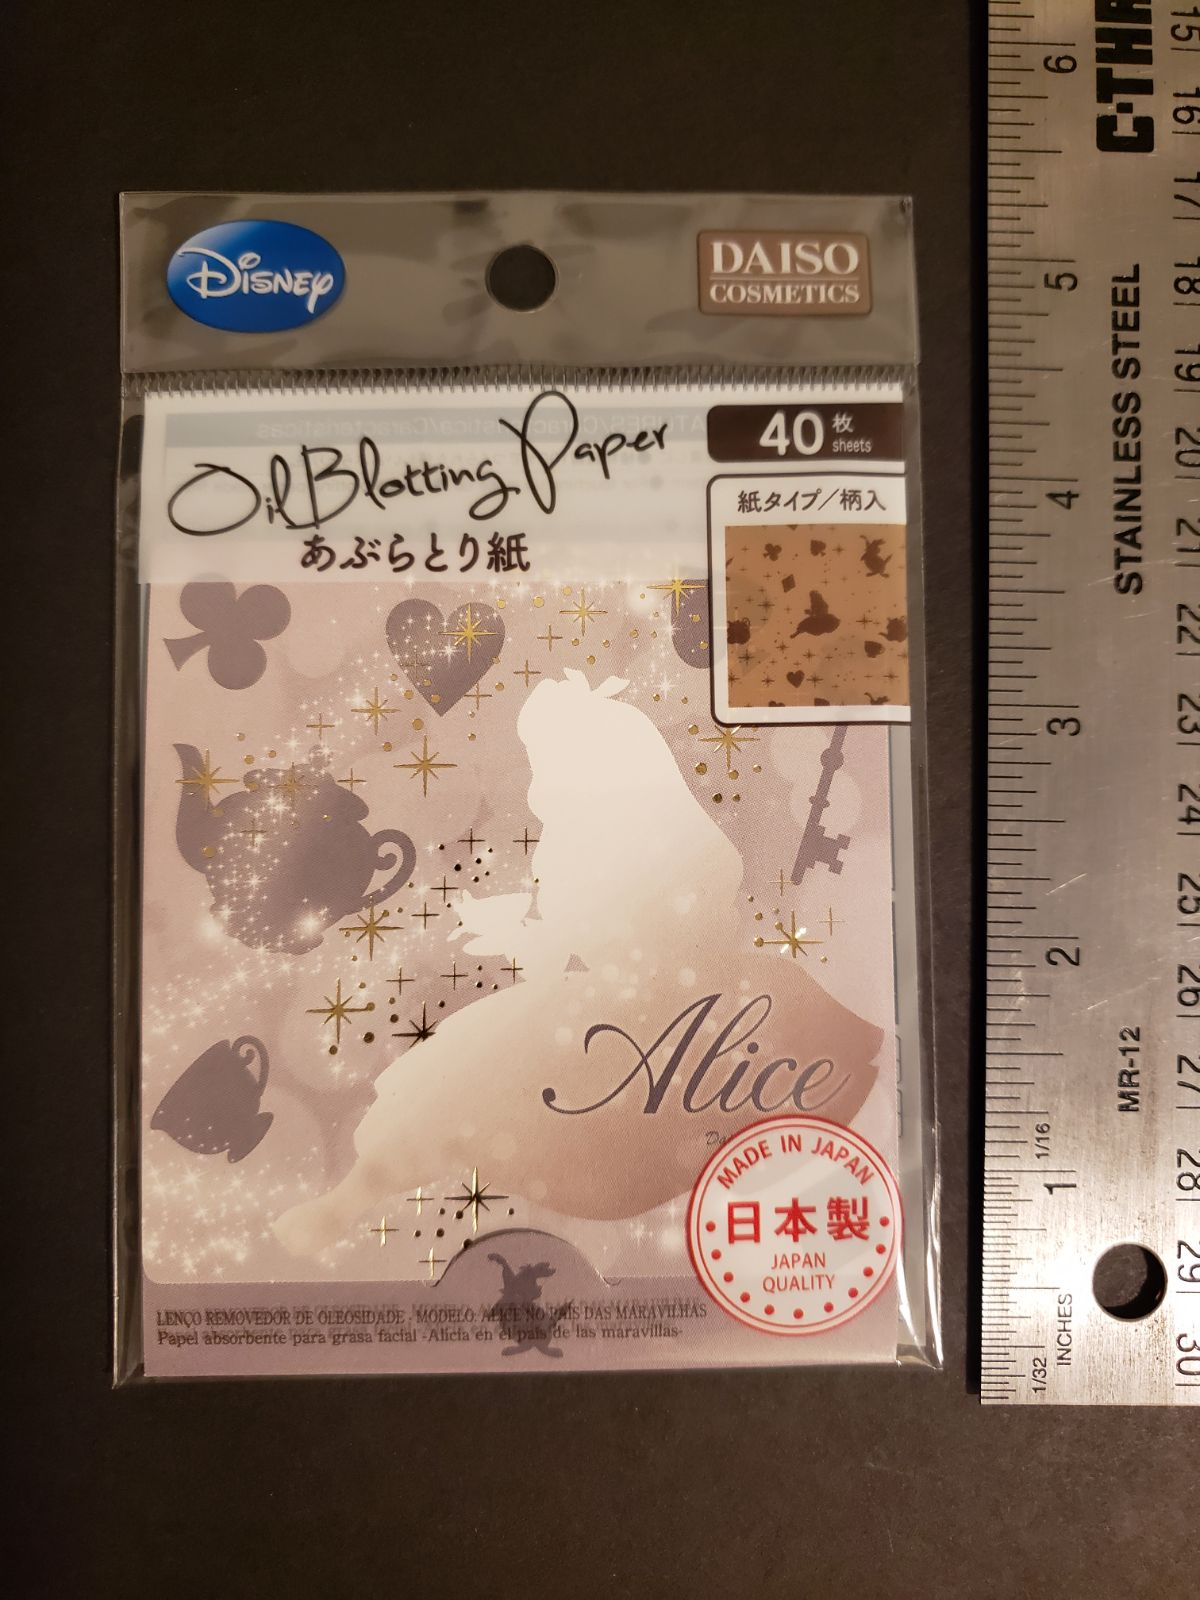 Disney Princess Oil Blotting Paper